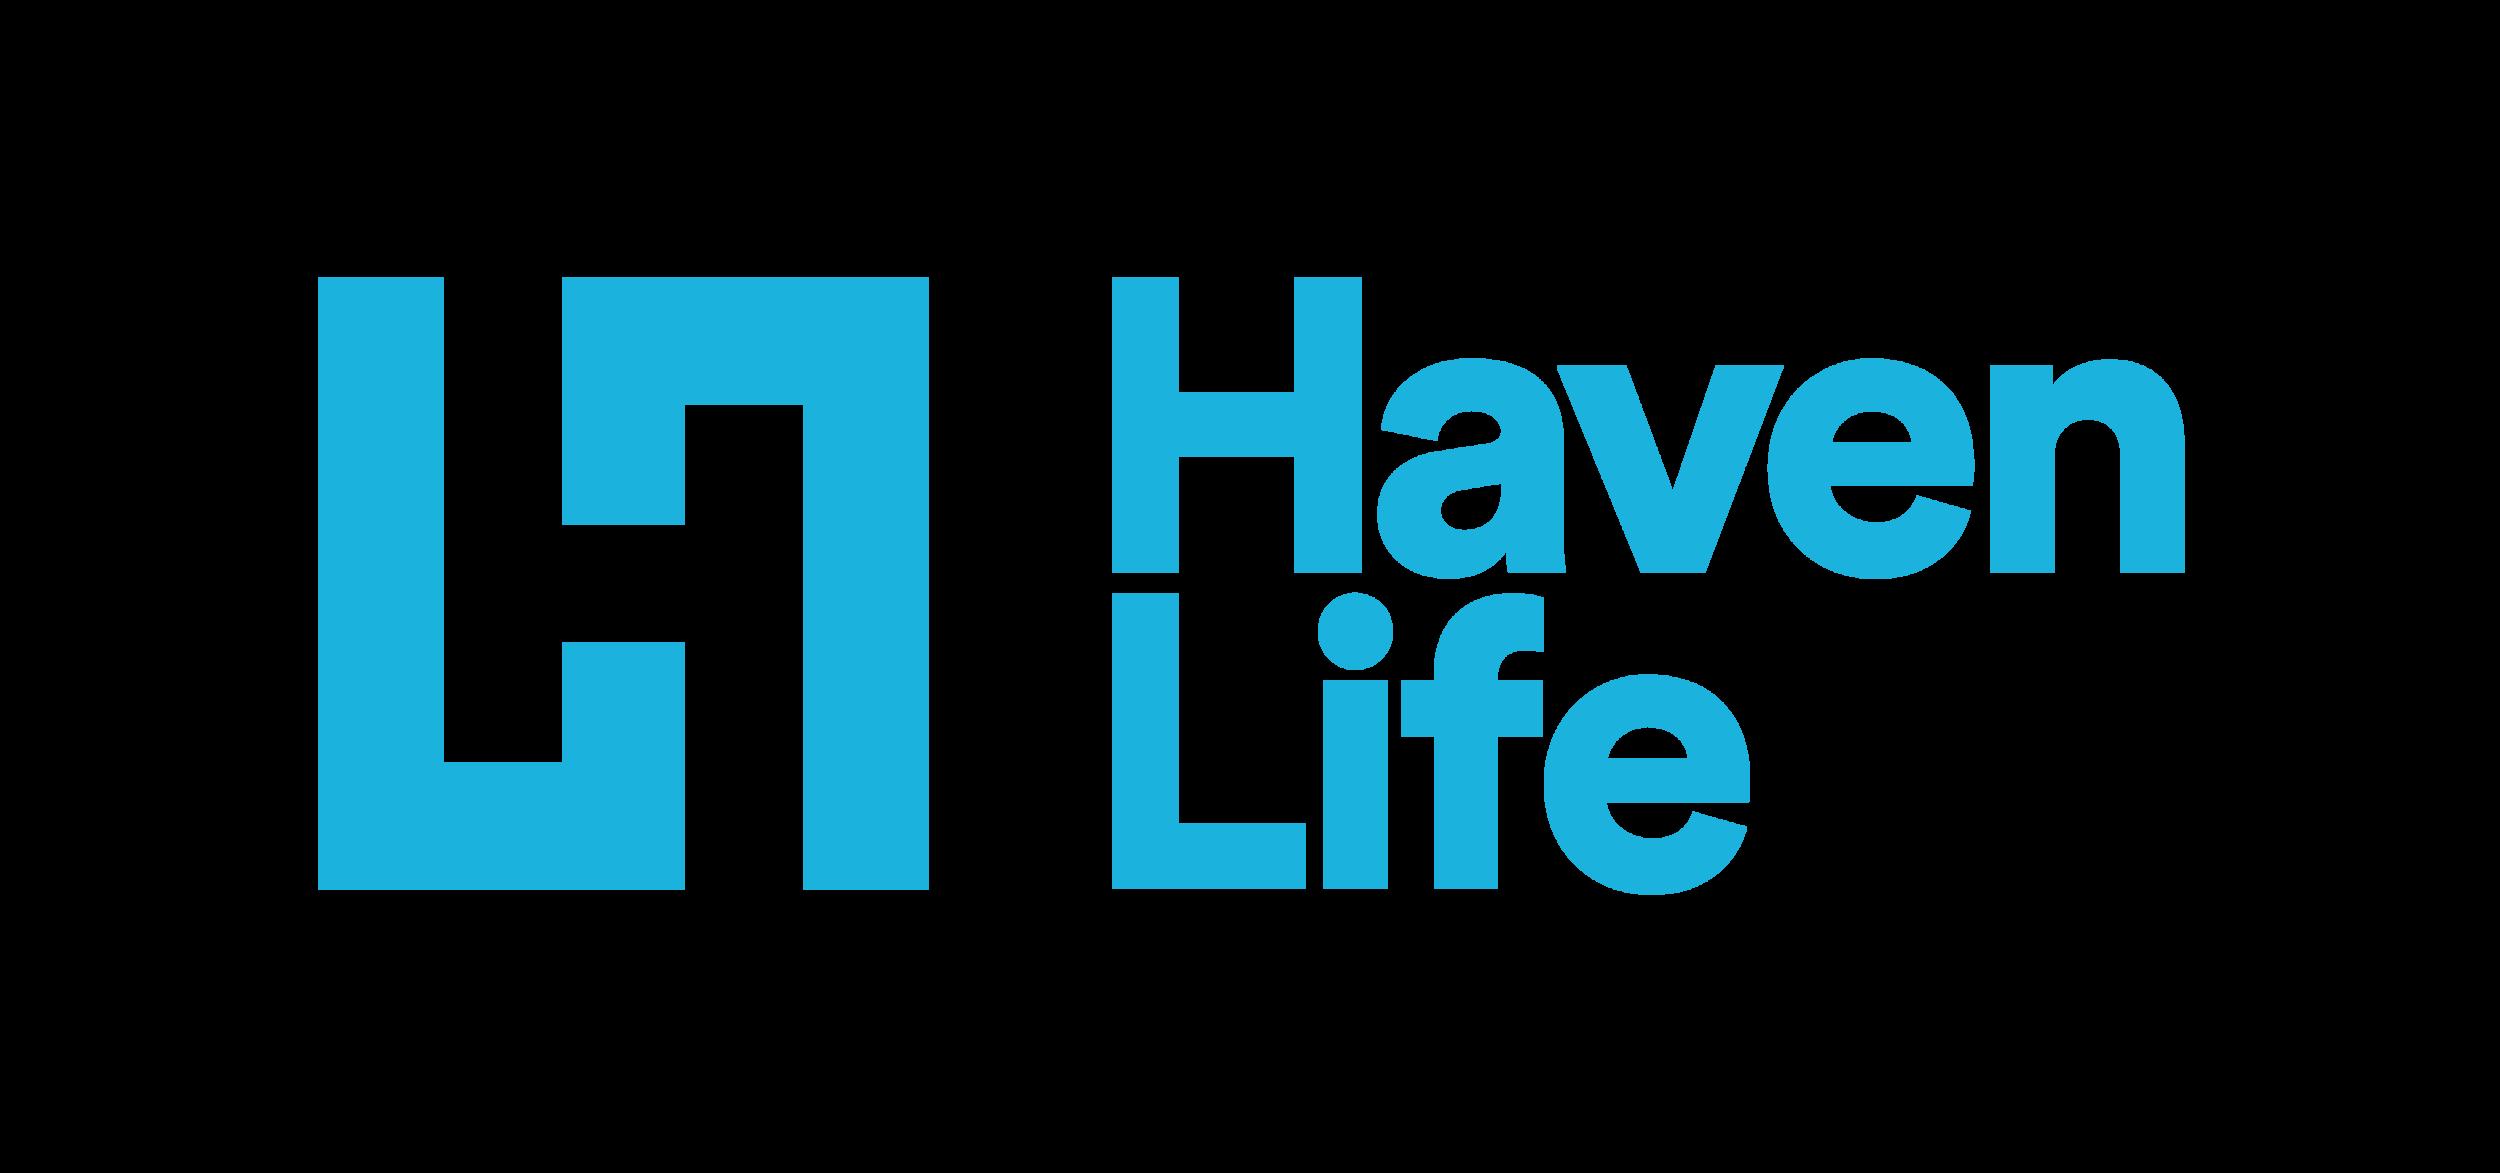 60279-haven-life-logo-2018-4068x1909.png